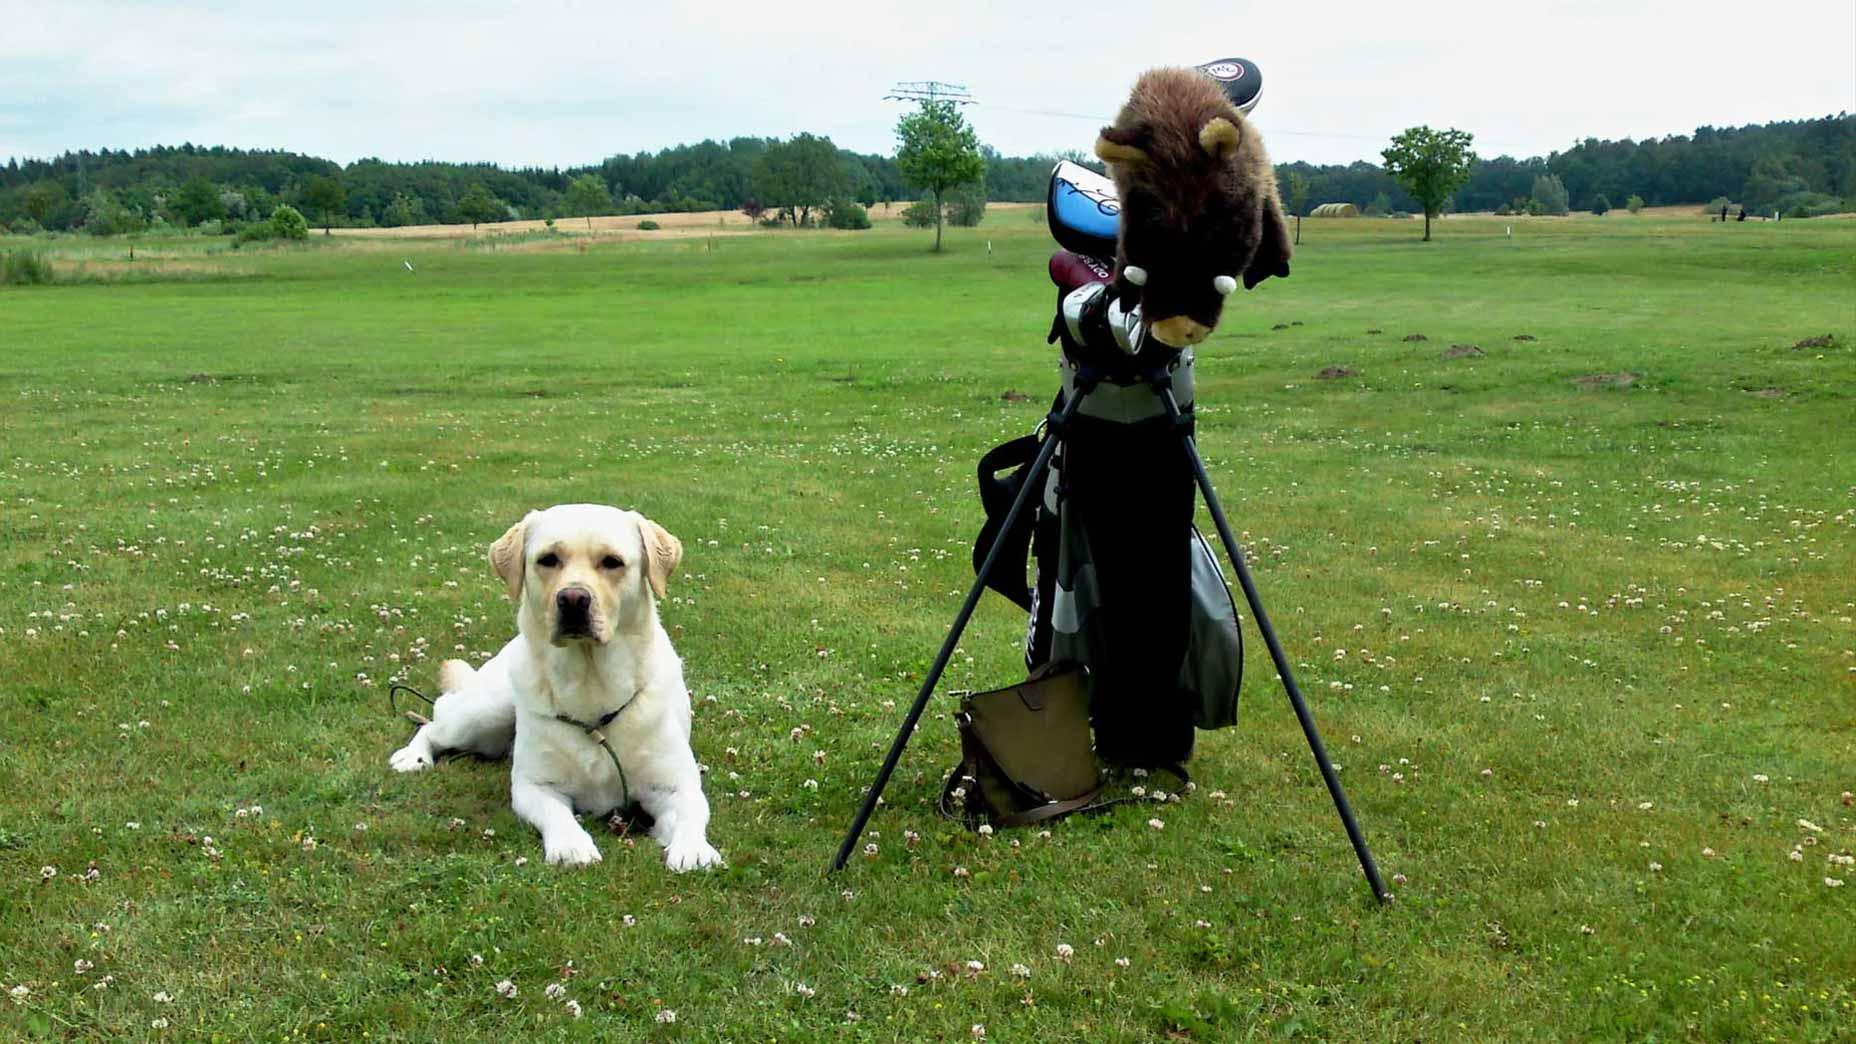 Golf with dog